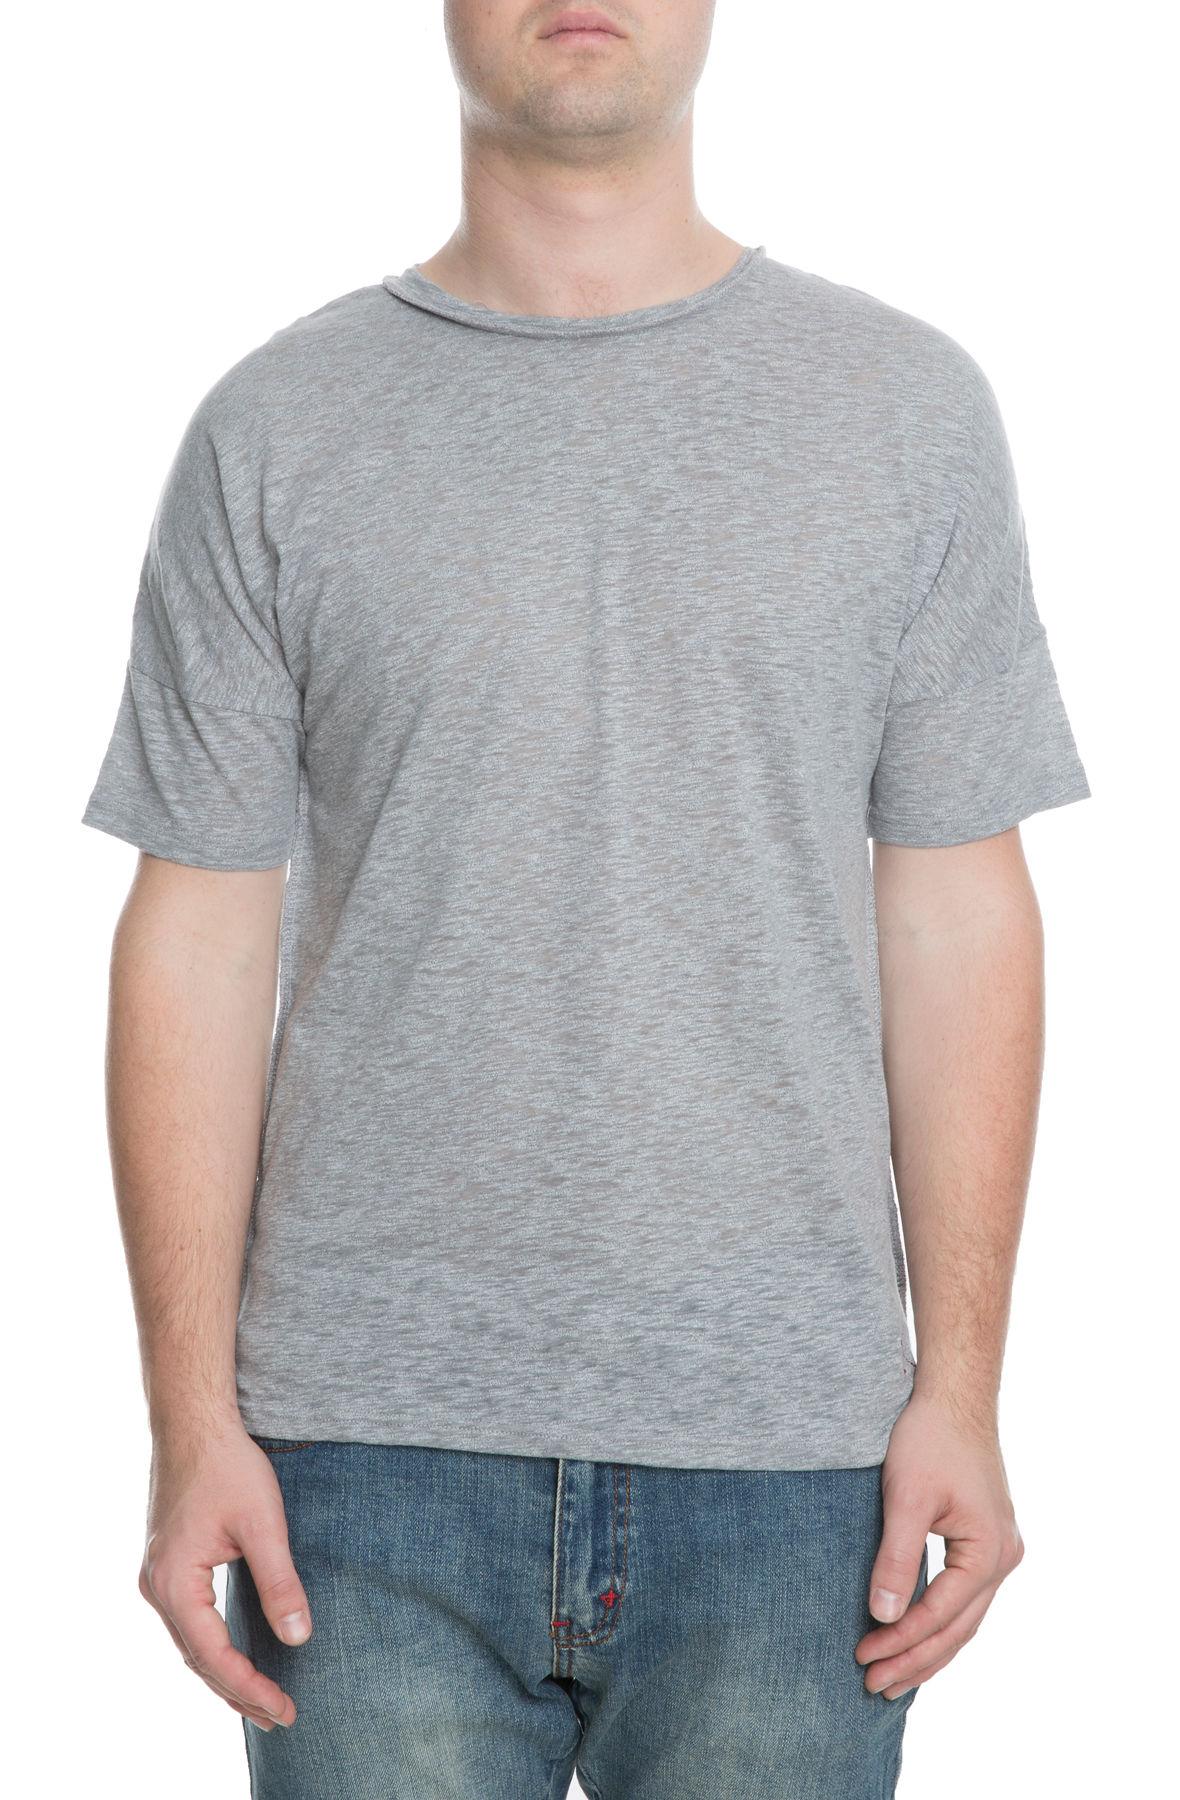 The Gator Off Shoulder Tee in Grey